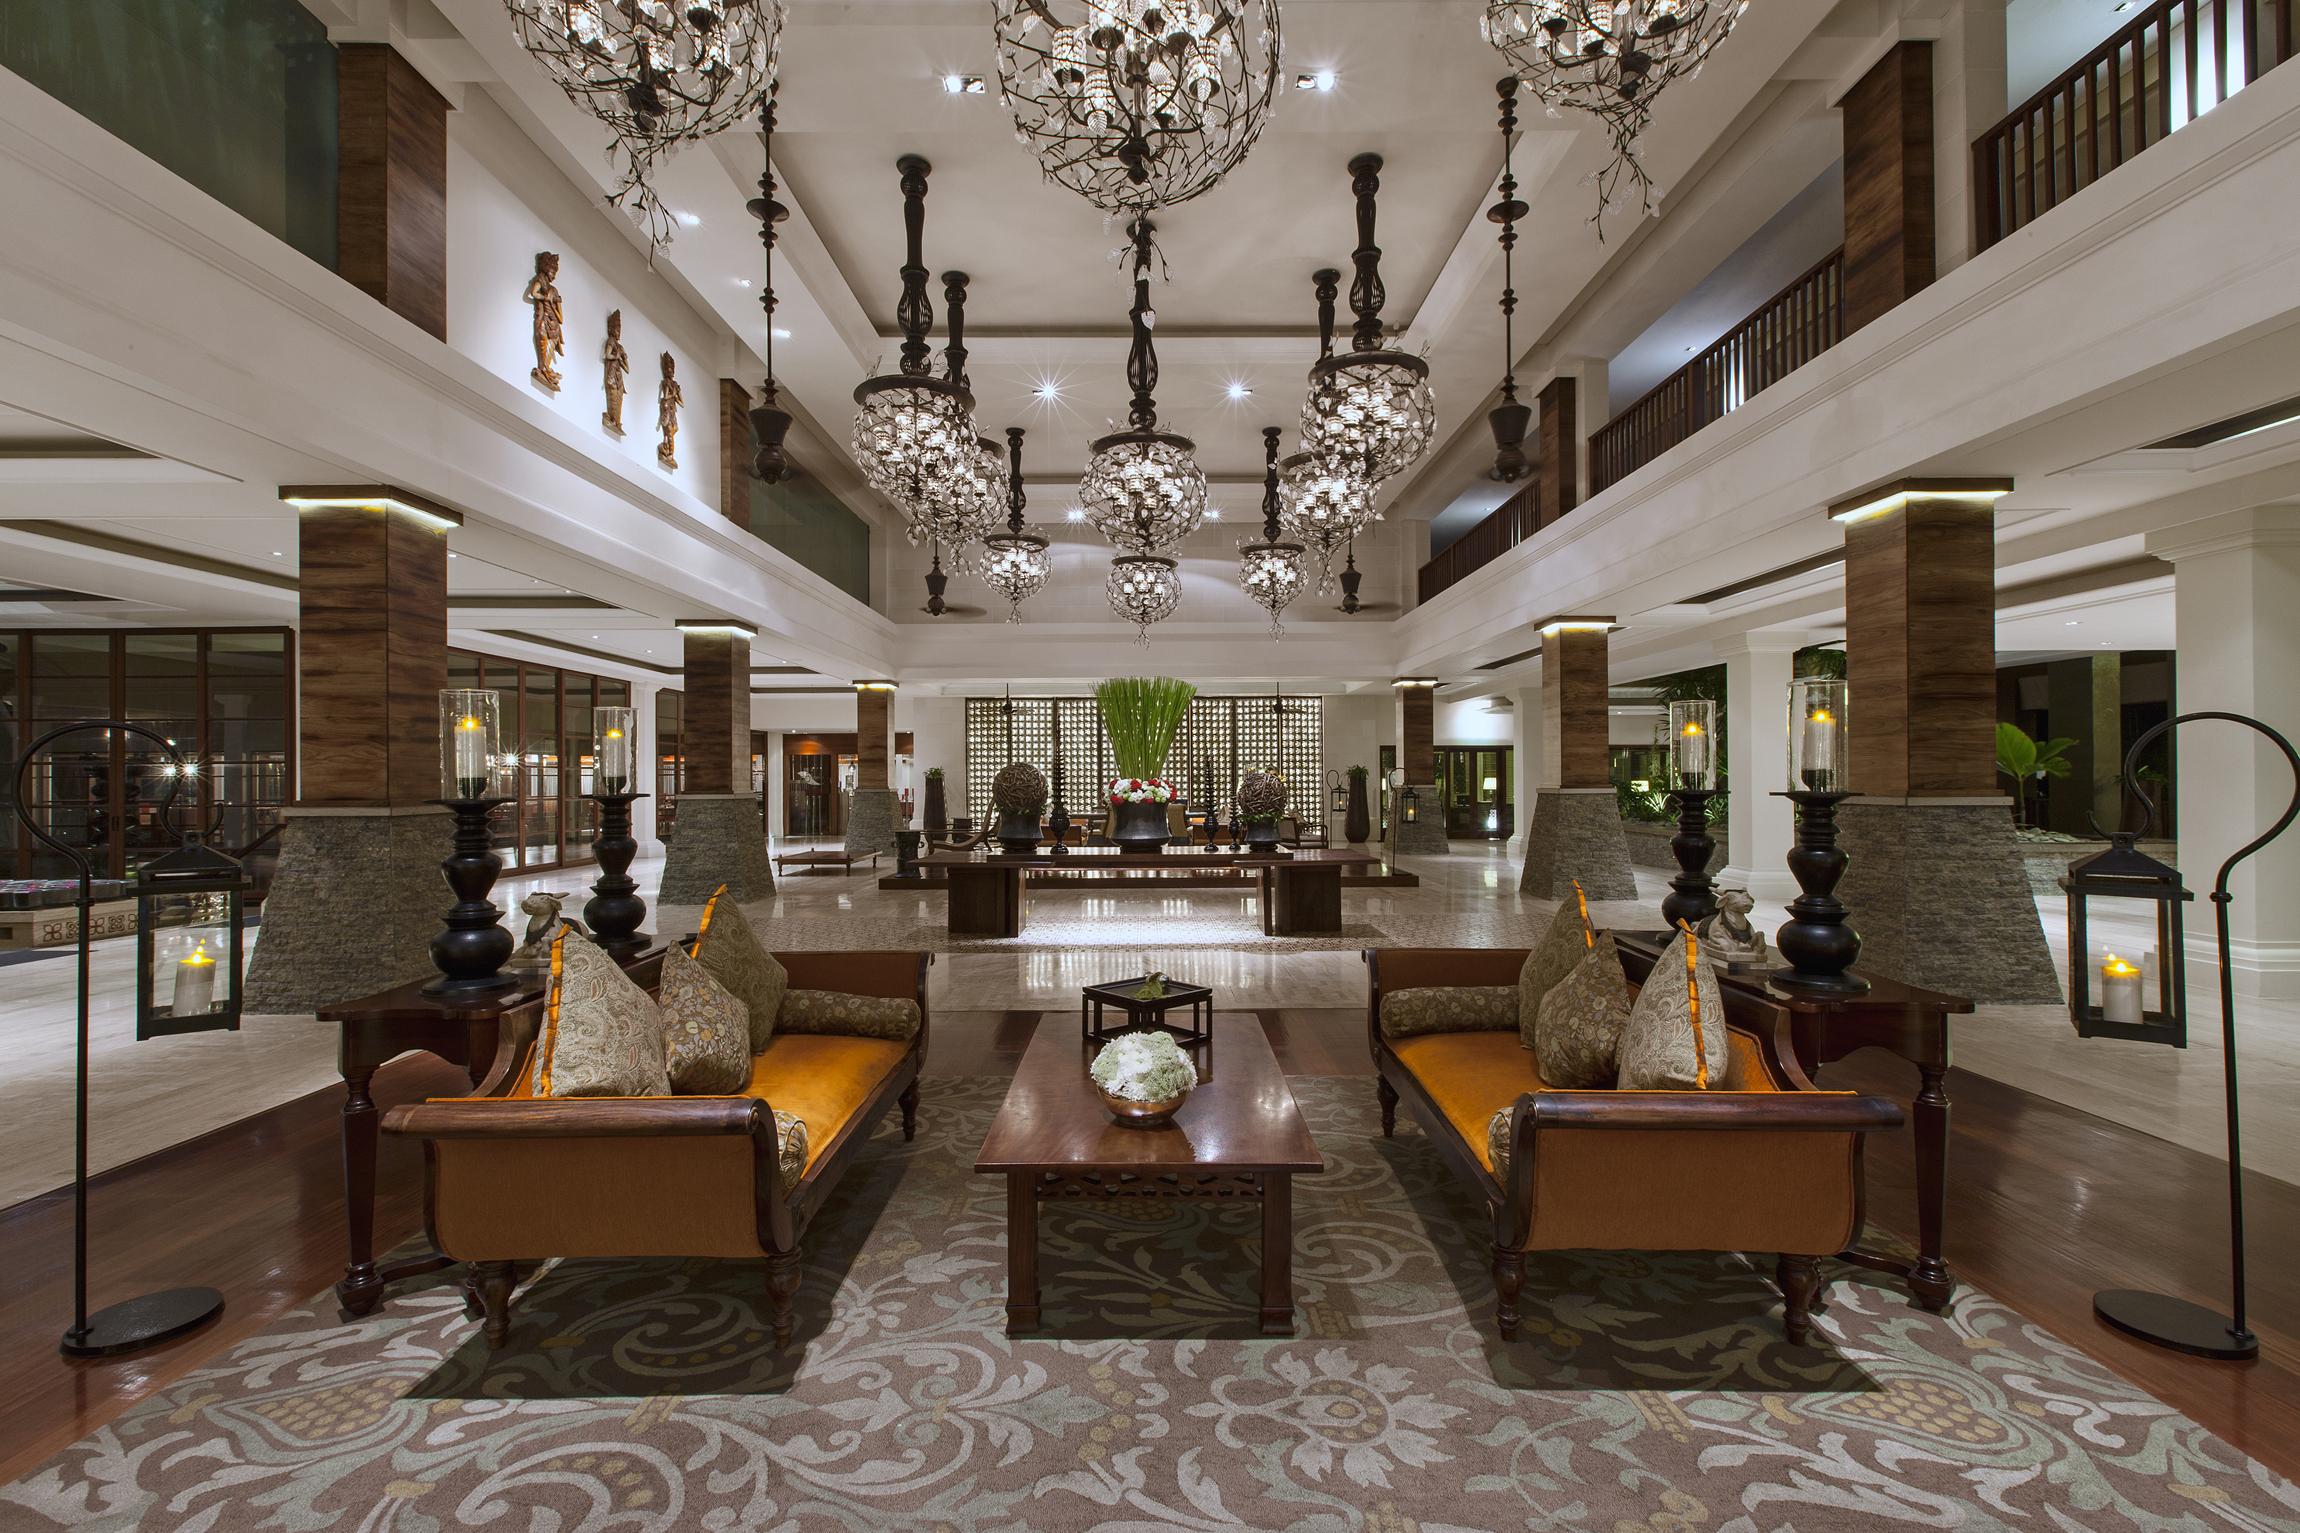 The St Regis Hotel Nusa Dua Bali The Jetsetting Fashionista